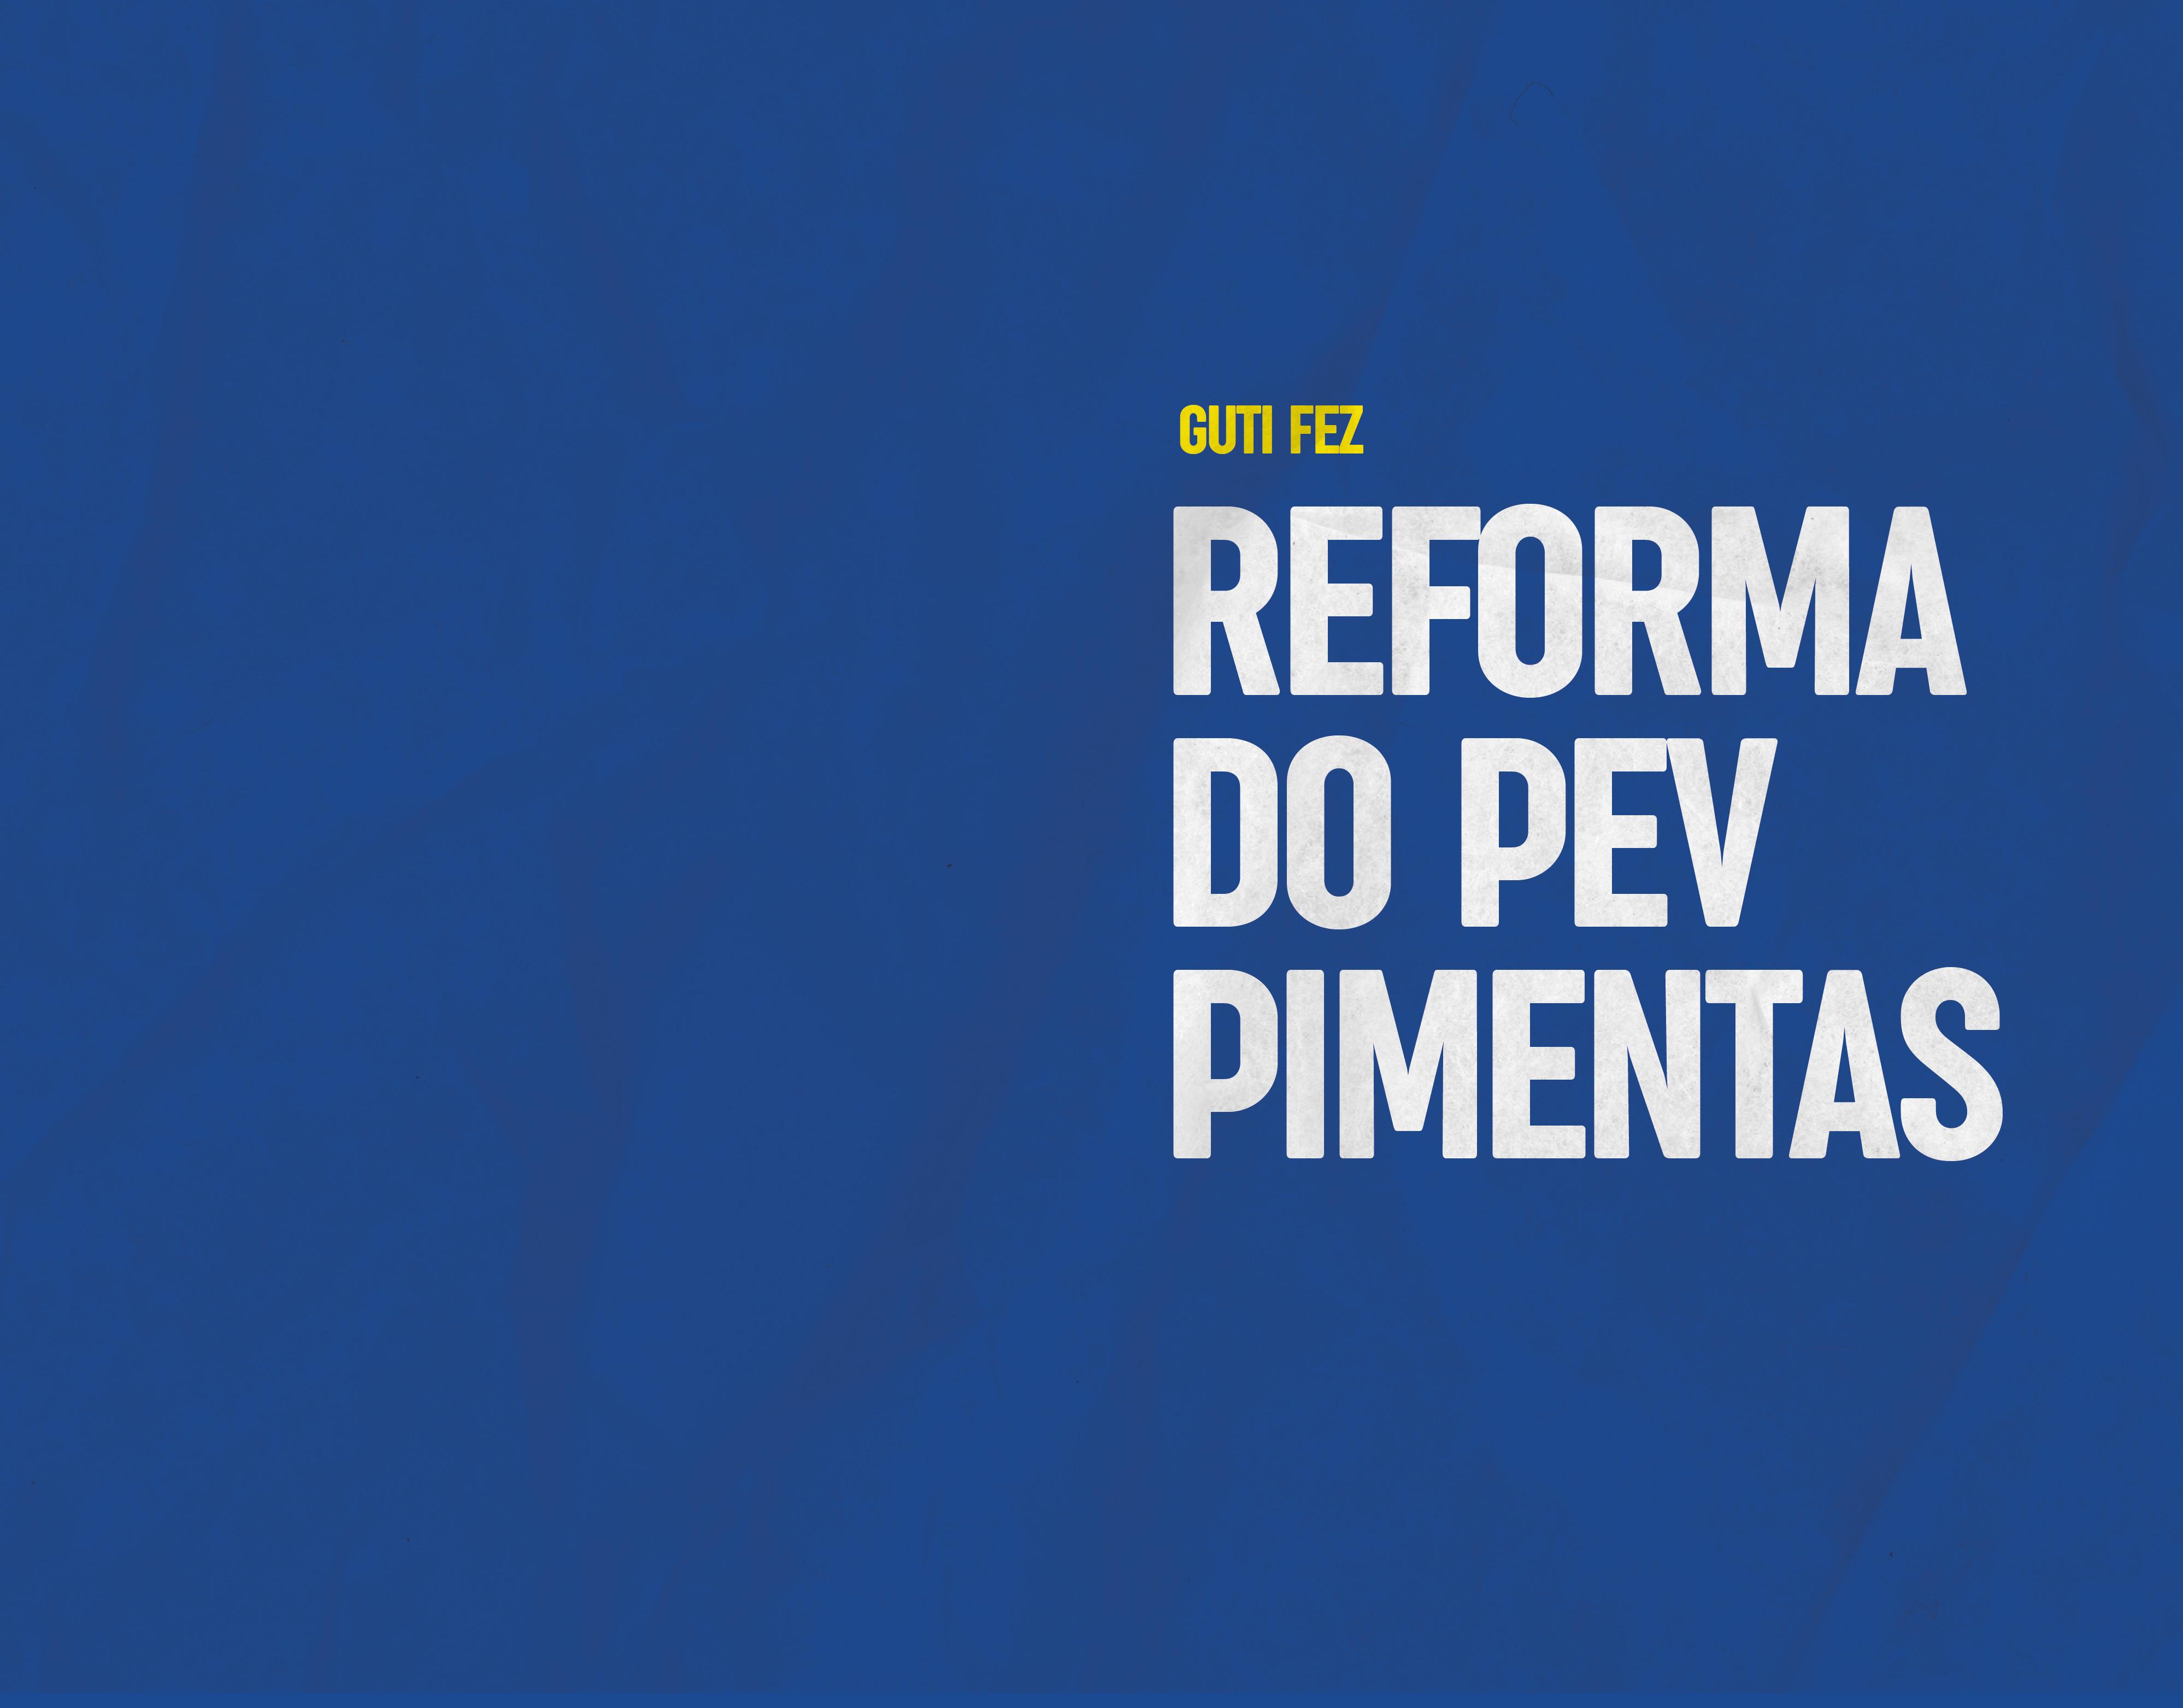 Reforma do PEV Pimentas